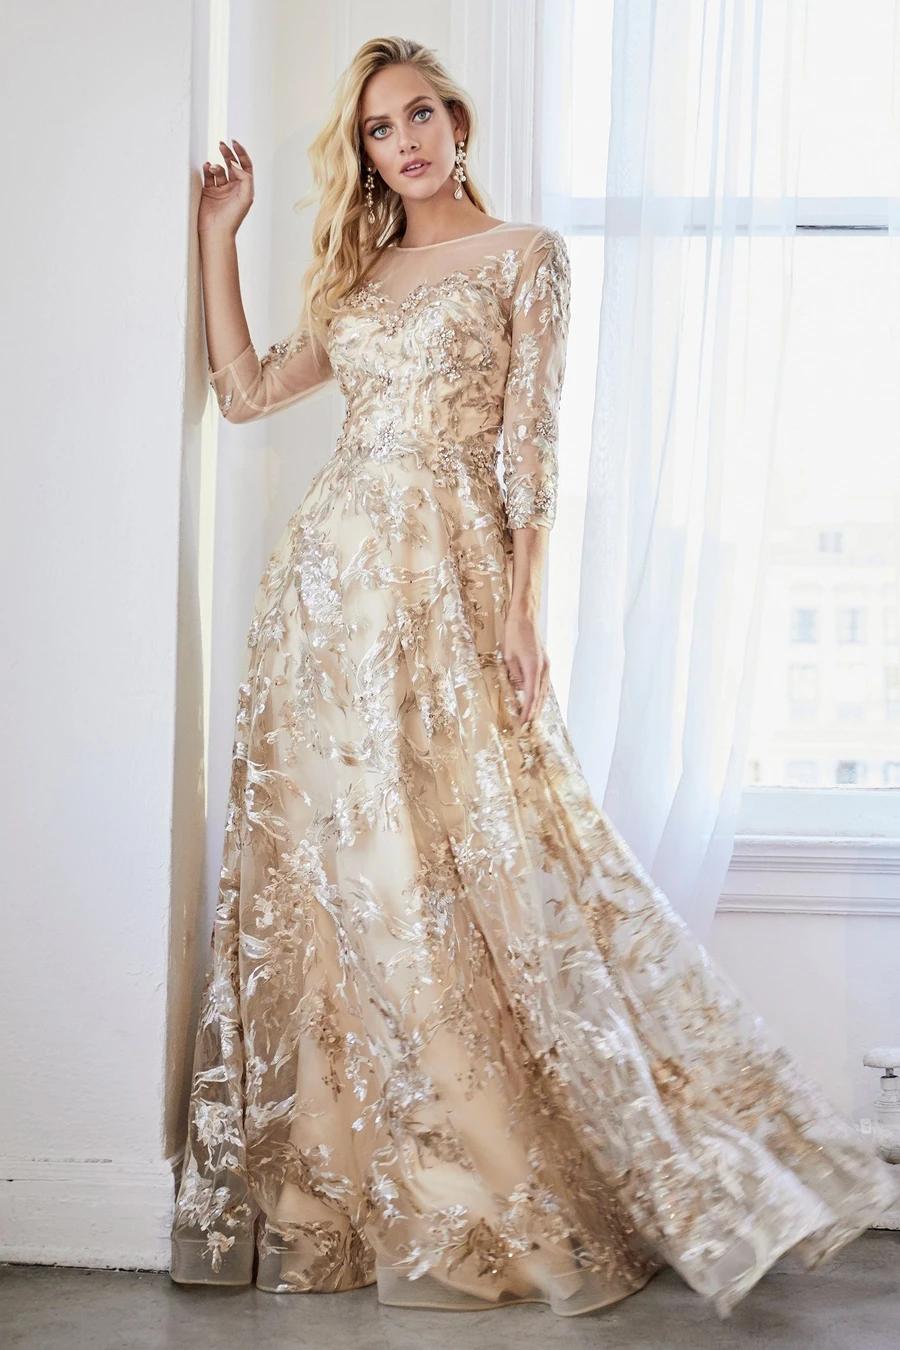 Applique Long 3 4 Sleeve Dress By Cinderella Divine Cr855 In 2021 Gold Formal Dress Cinderella Divine Champagne Gold Dress [ 1350 x 900 Pixel ]